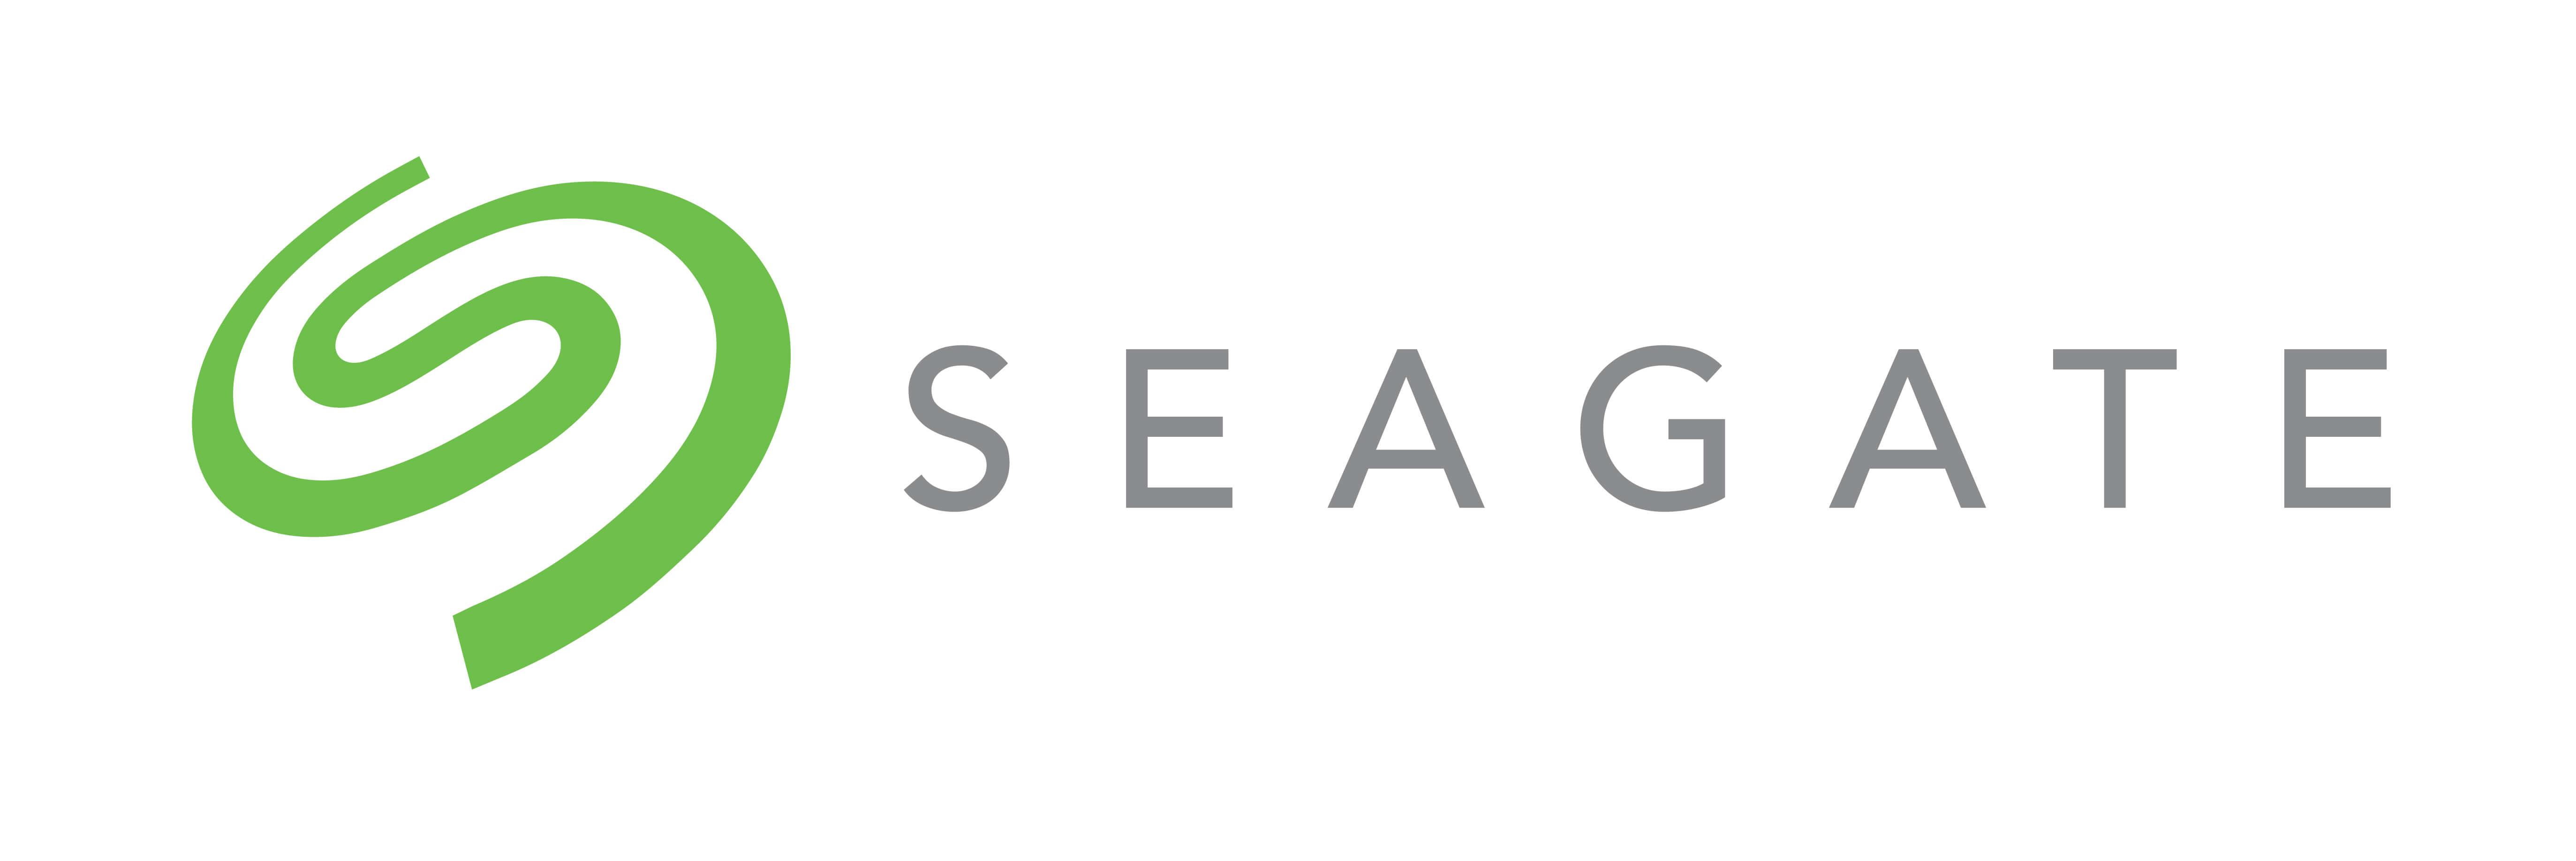 Seagate Enterprise HDD ST4000NM0033 4TB ssdbazar 2 - هارد دیسک اینترپرایز سیگیت Seagate Enterprise HDD ST4000NM0033 4TB